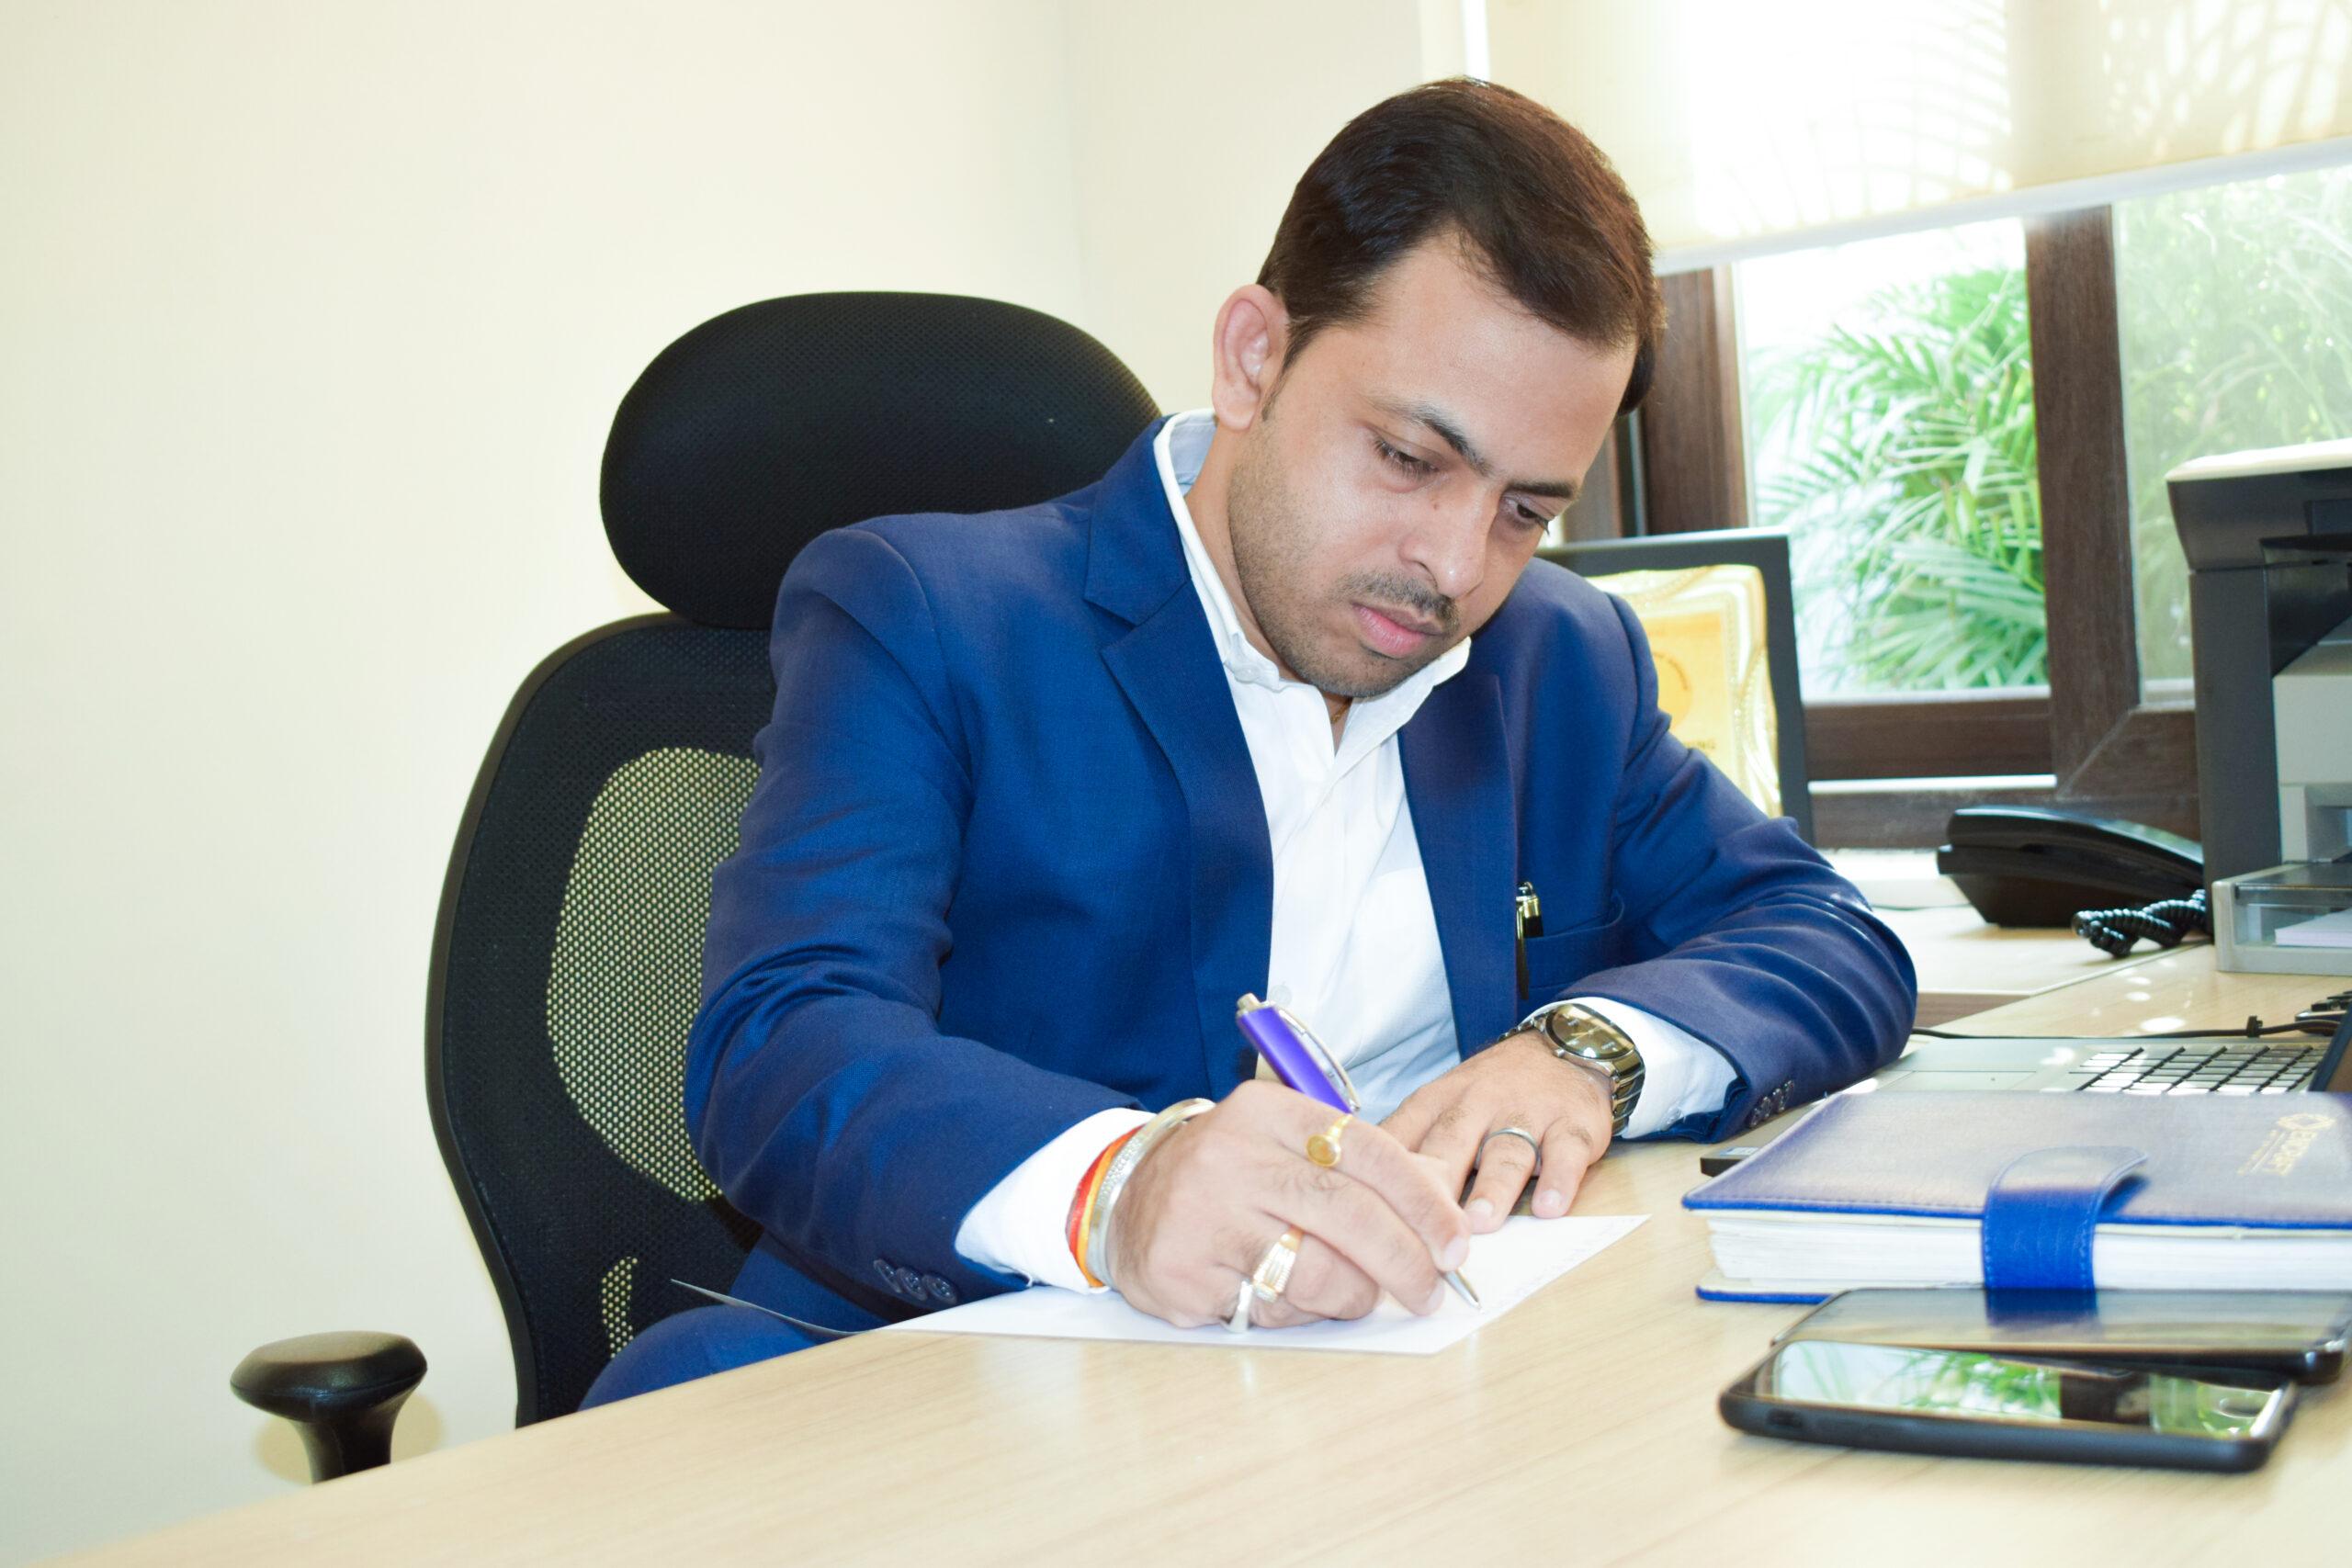 Truly dedicated, truly trusted: Avanish Singh Visen, Encraft India